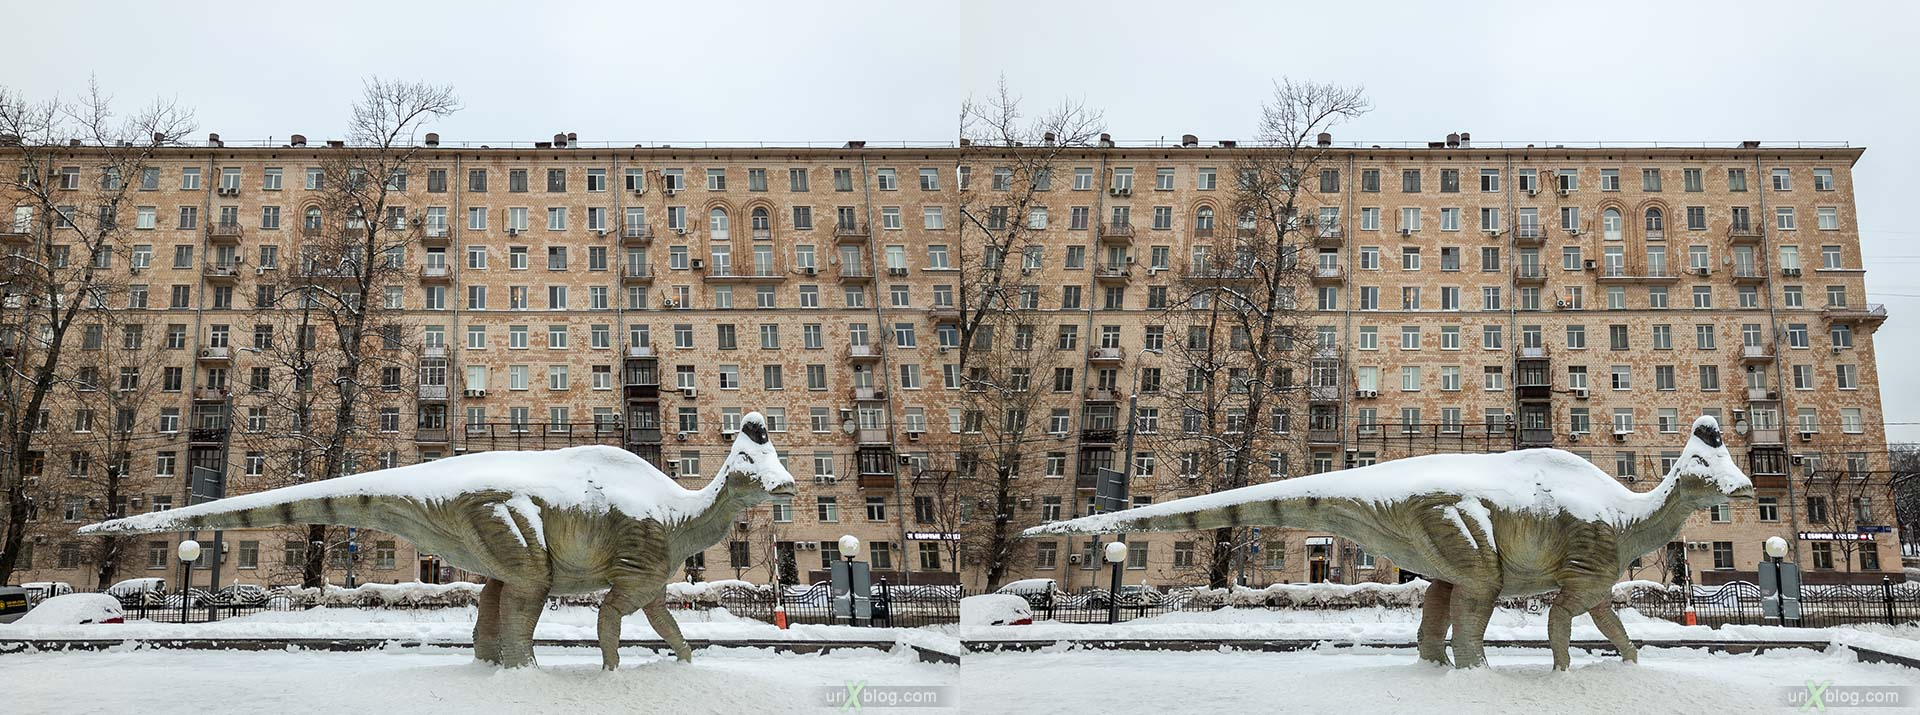 Darwin museum, dinosaur, Amurosaurus, hadrosaur, winter, snow, Moscow, Russia, 3D, stereo pair, cross-eyed, crossview, cross view stereo pair, stereoscopic